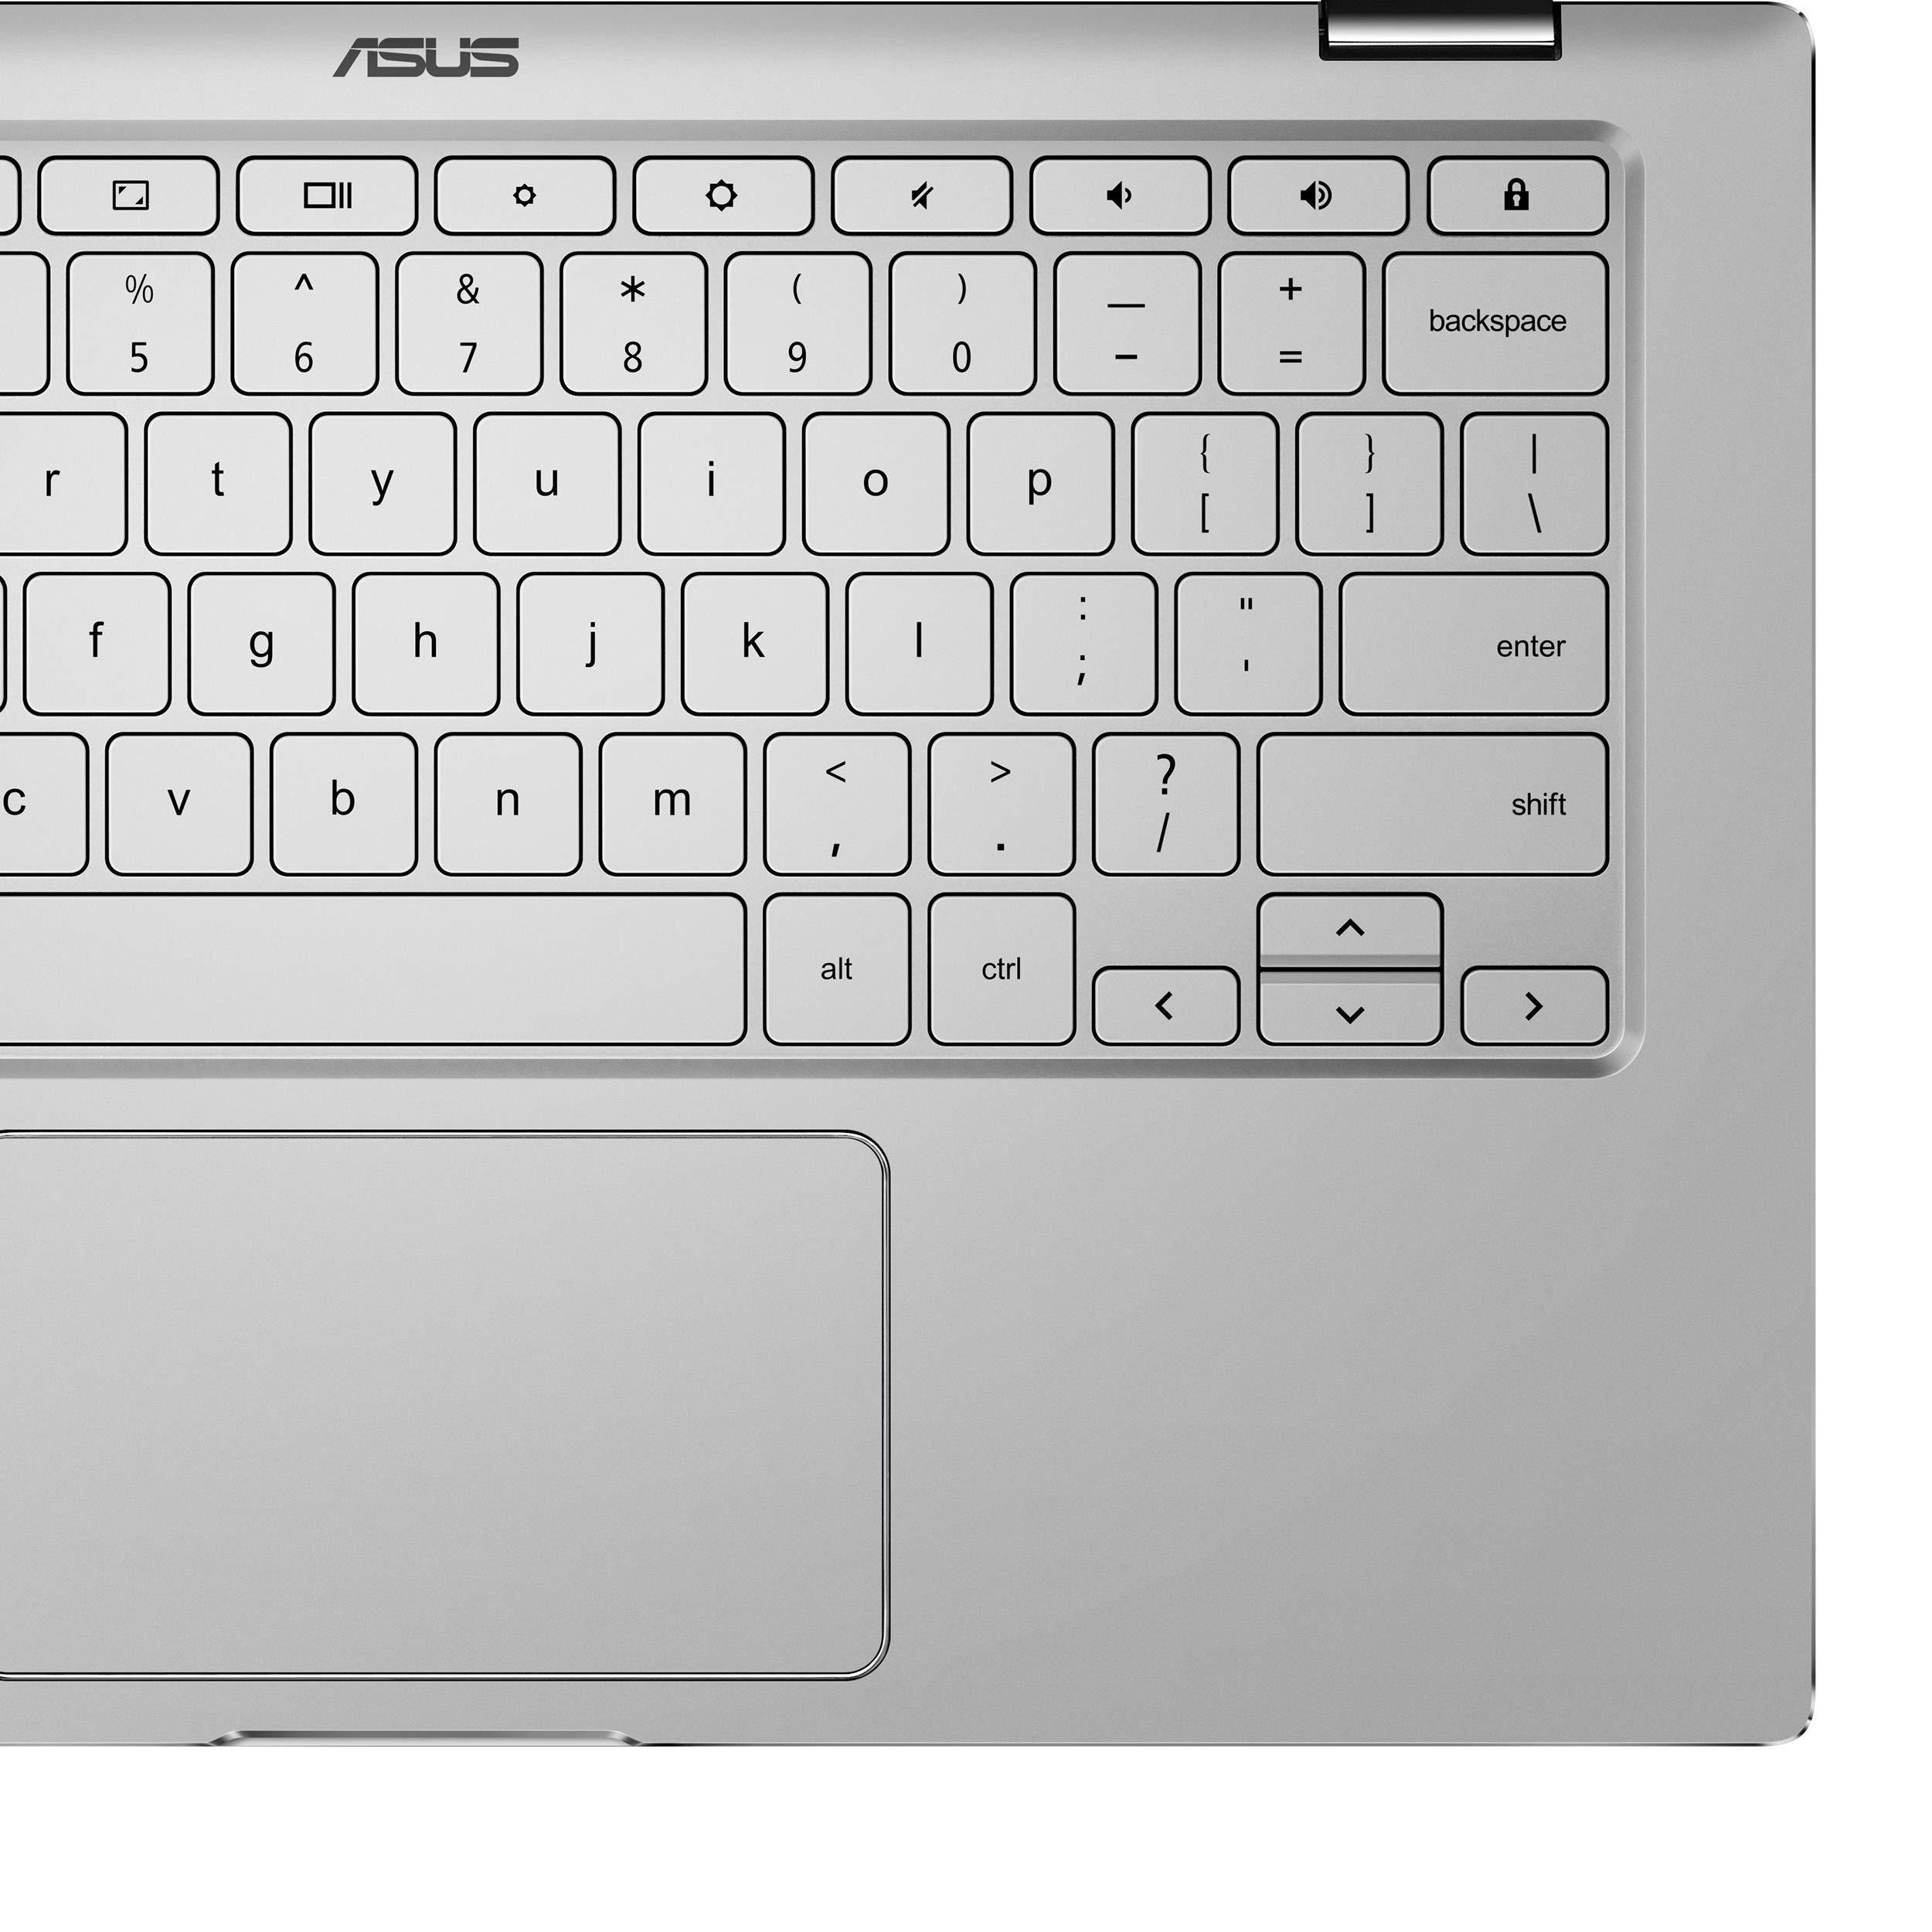 ASUS Chromebook Flip C434TA-DSM4T 2-in-1 Laptop 14'' Touchscreen Full HD 4-Way NanoEdge, Intel Core M3-8100Y Processor, 4GB RAM, 64GB eMMC Storage, Chrome OS by ASUS (Image #5)